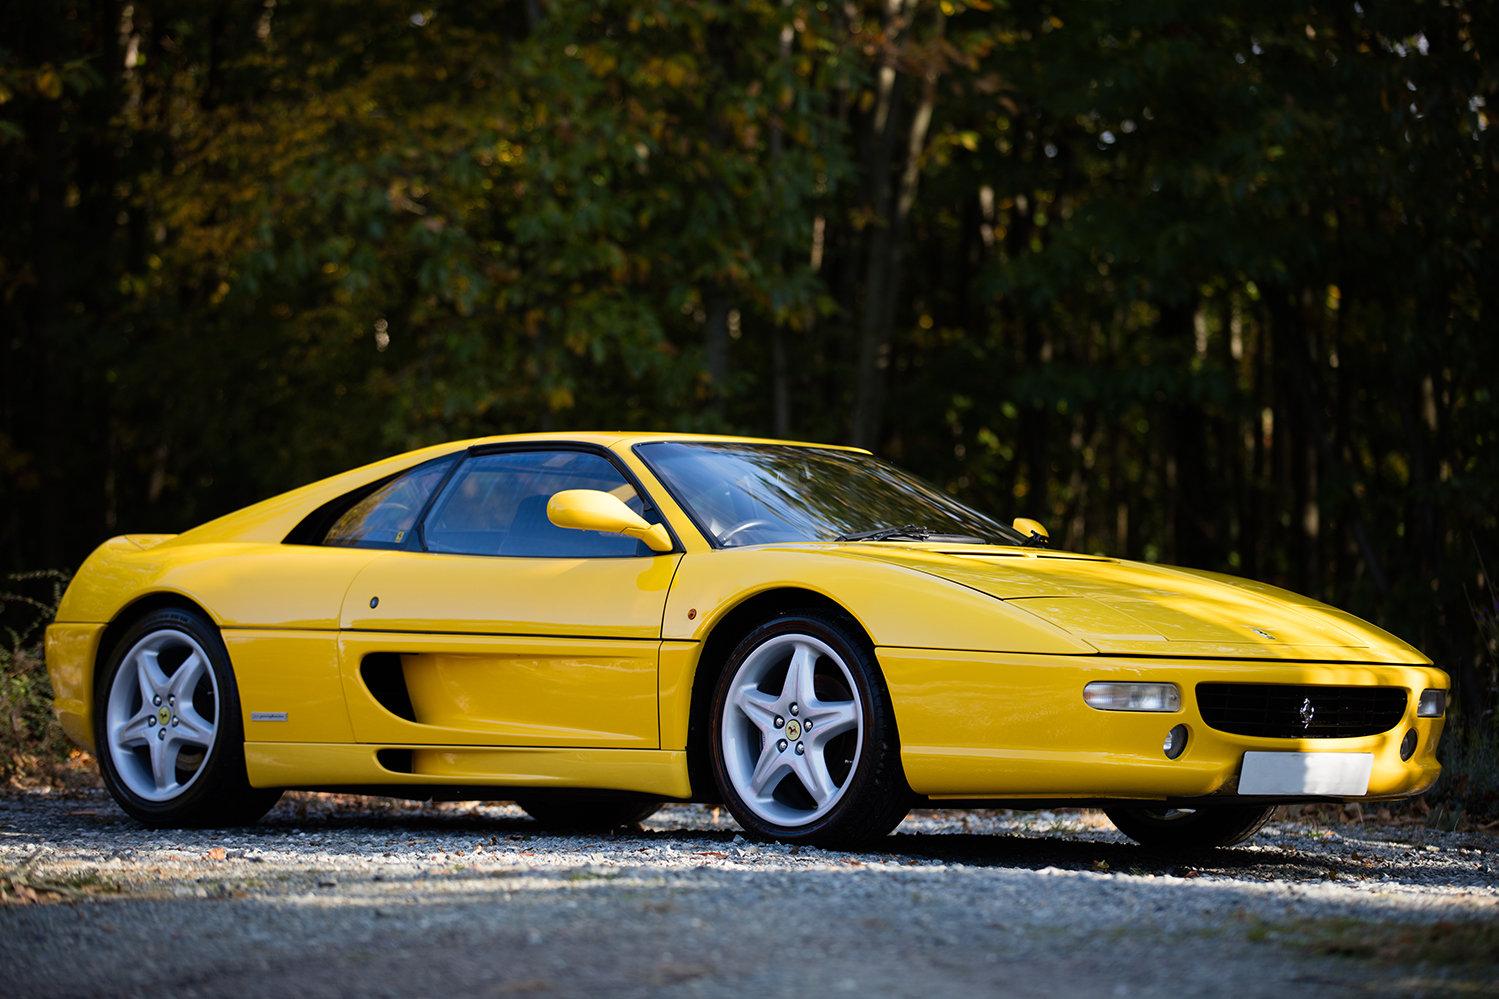 1995 Ferrari F355 GTS Manual For Sale (picture 1 of 6)